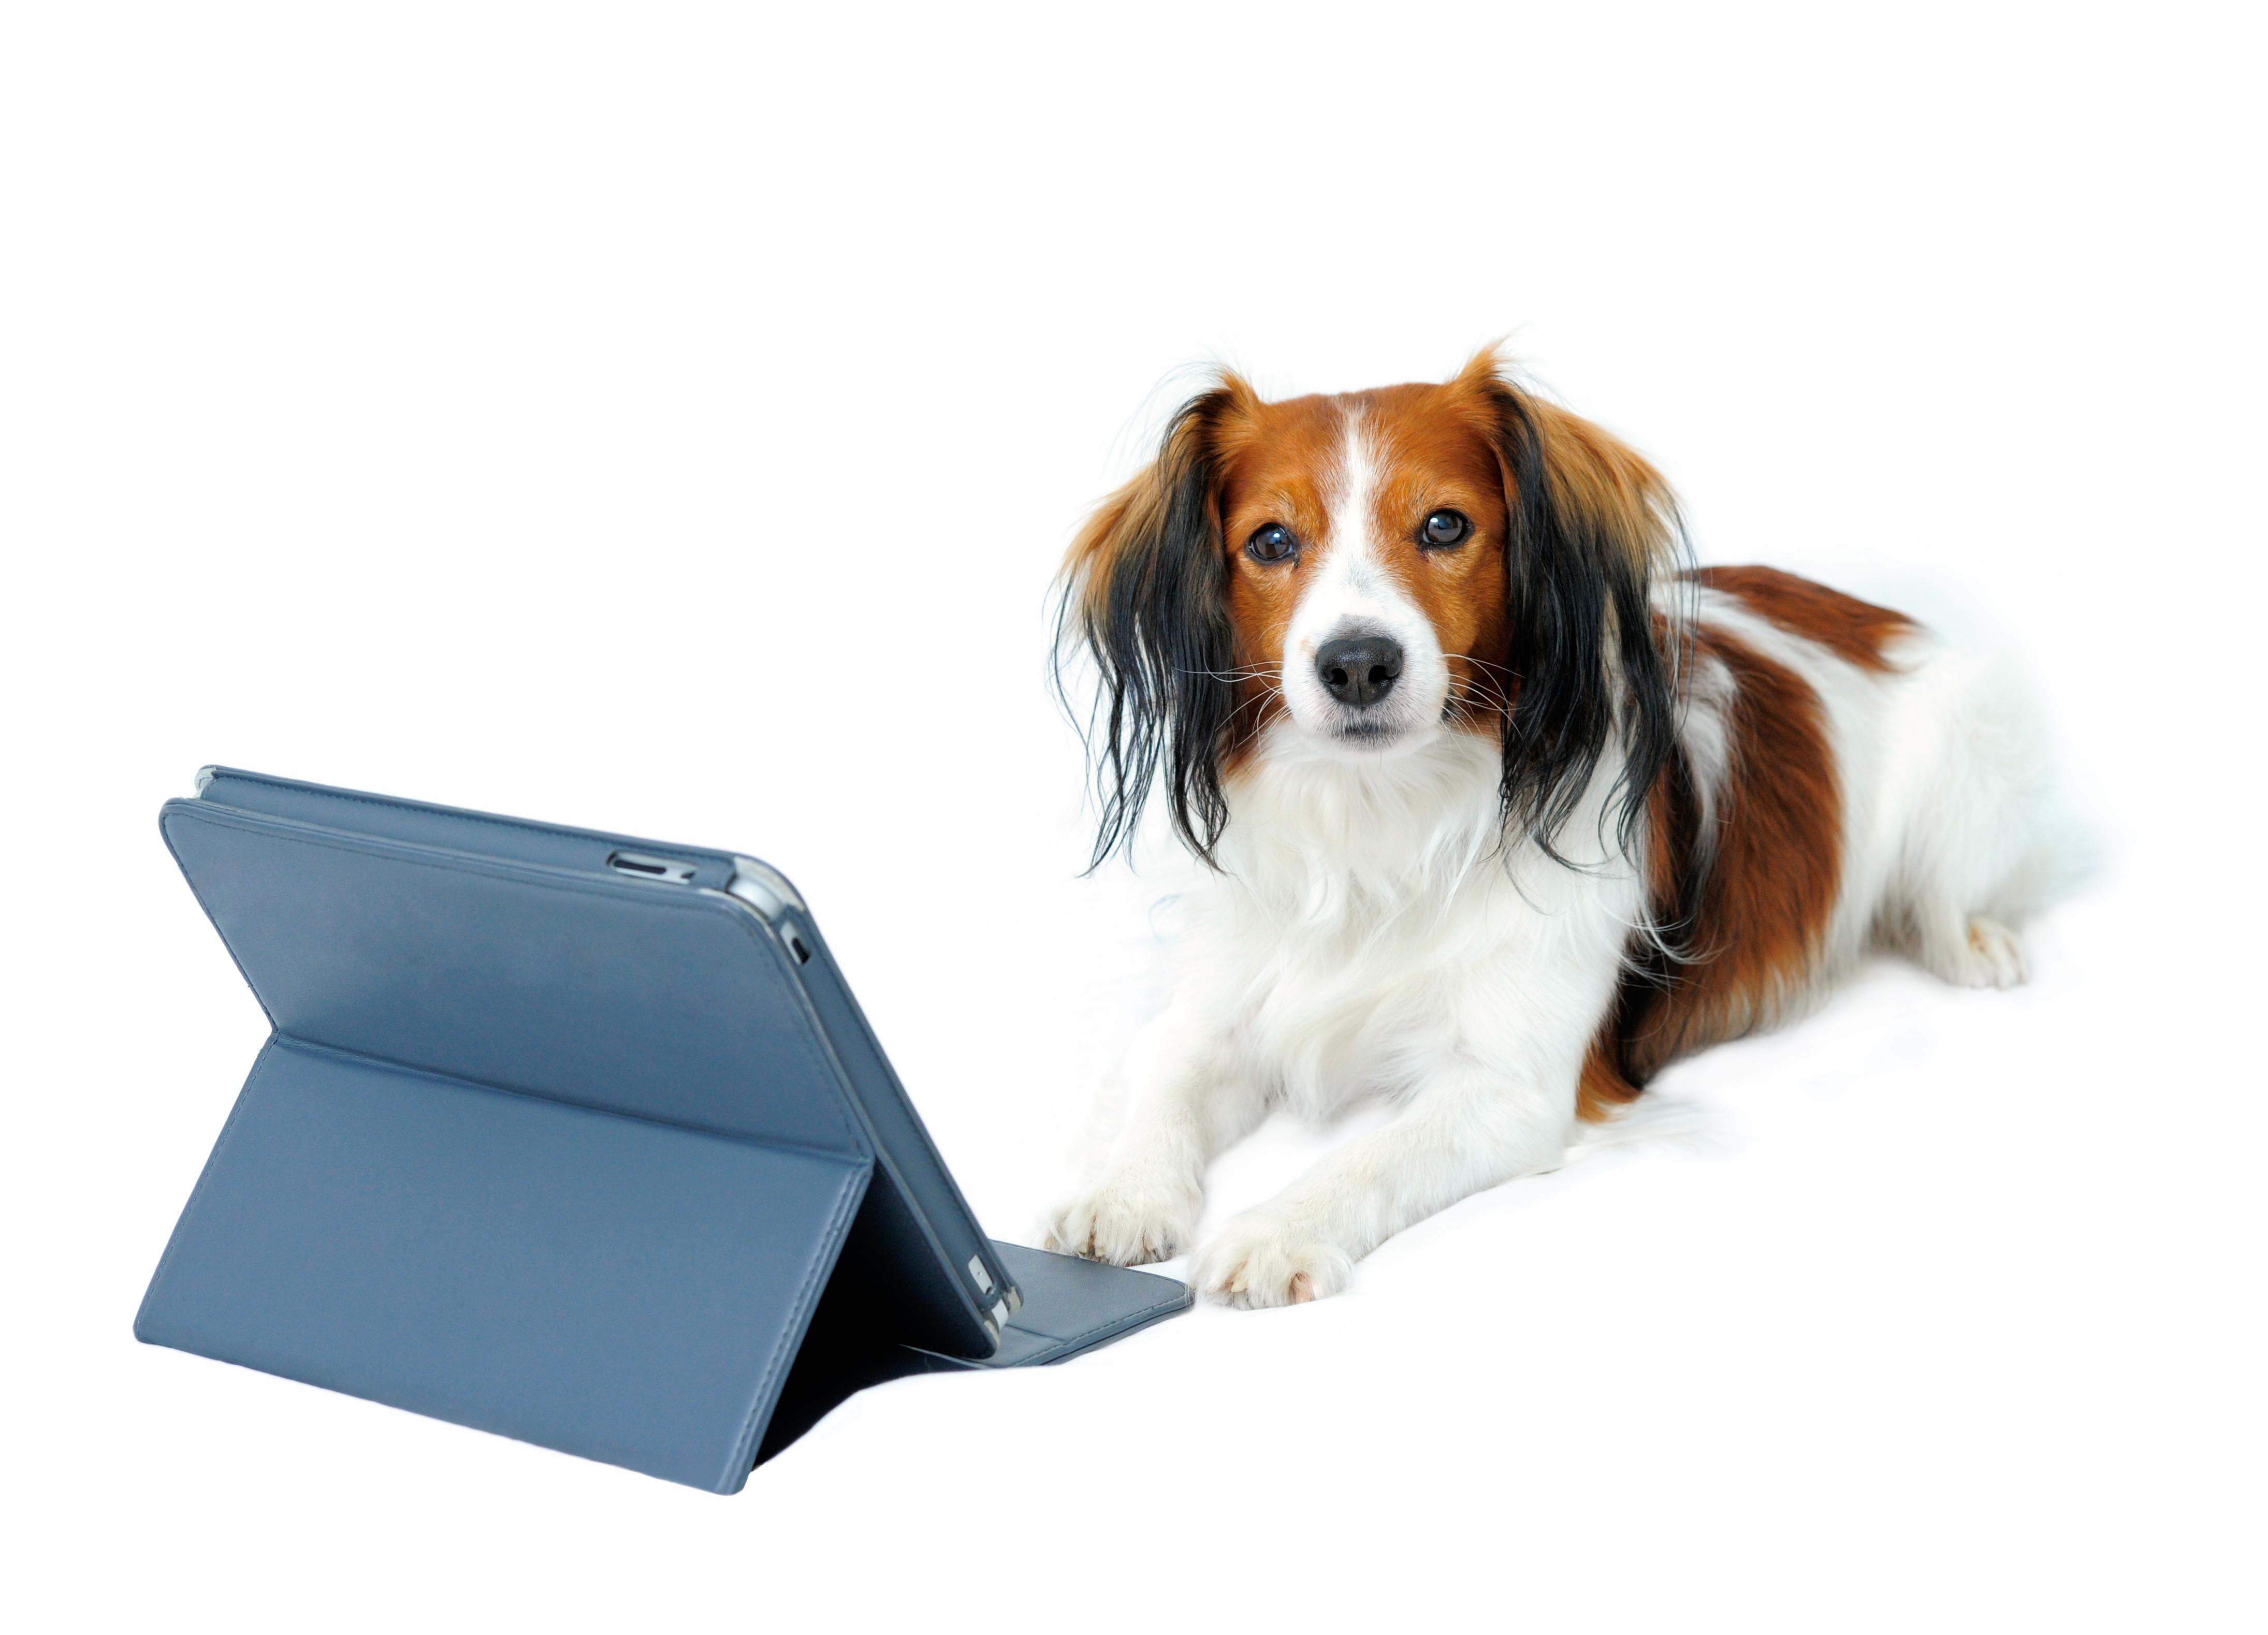 1 on 1 Online Training - Basic Skills